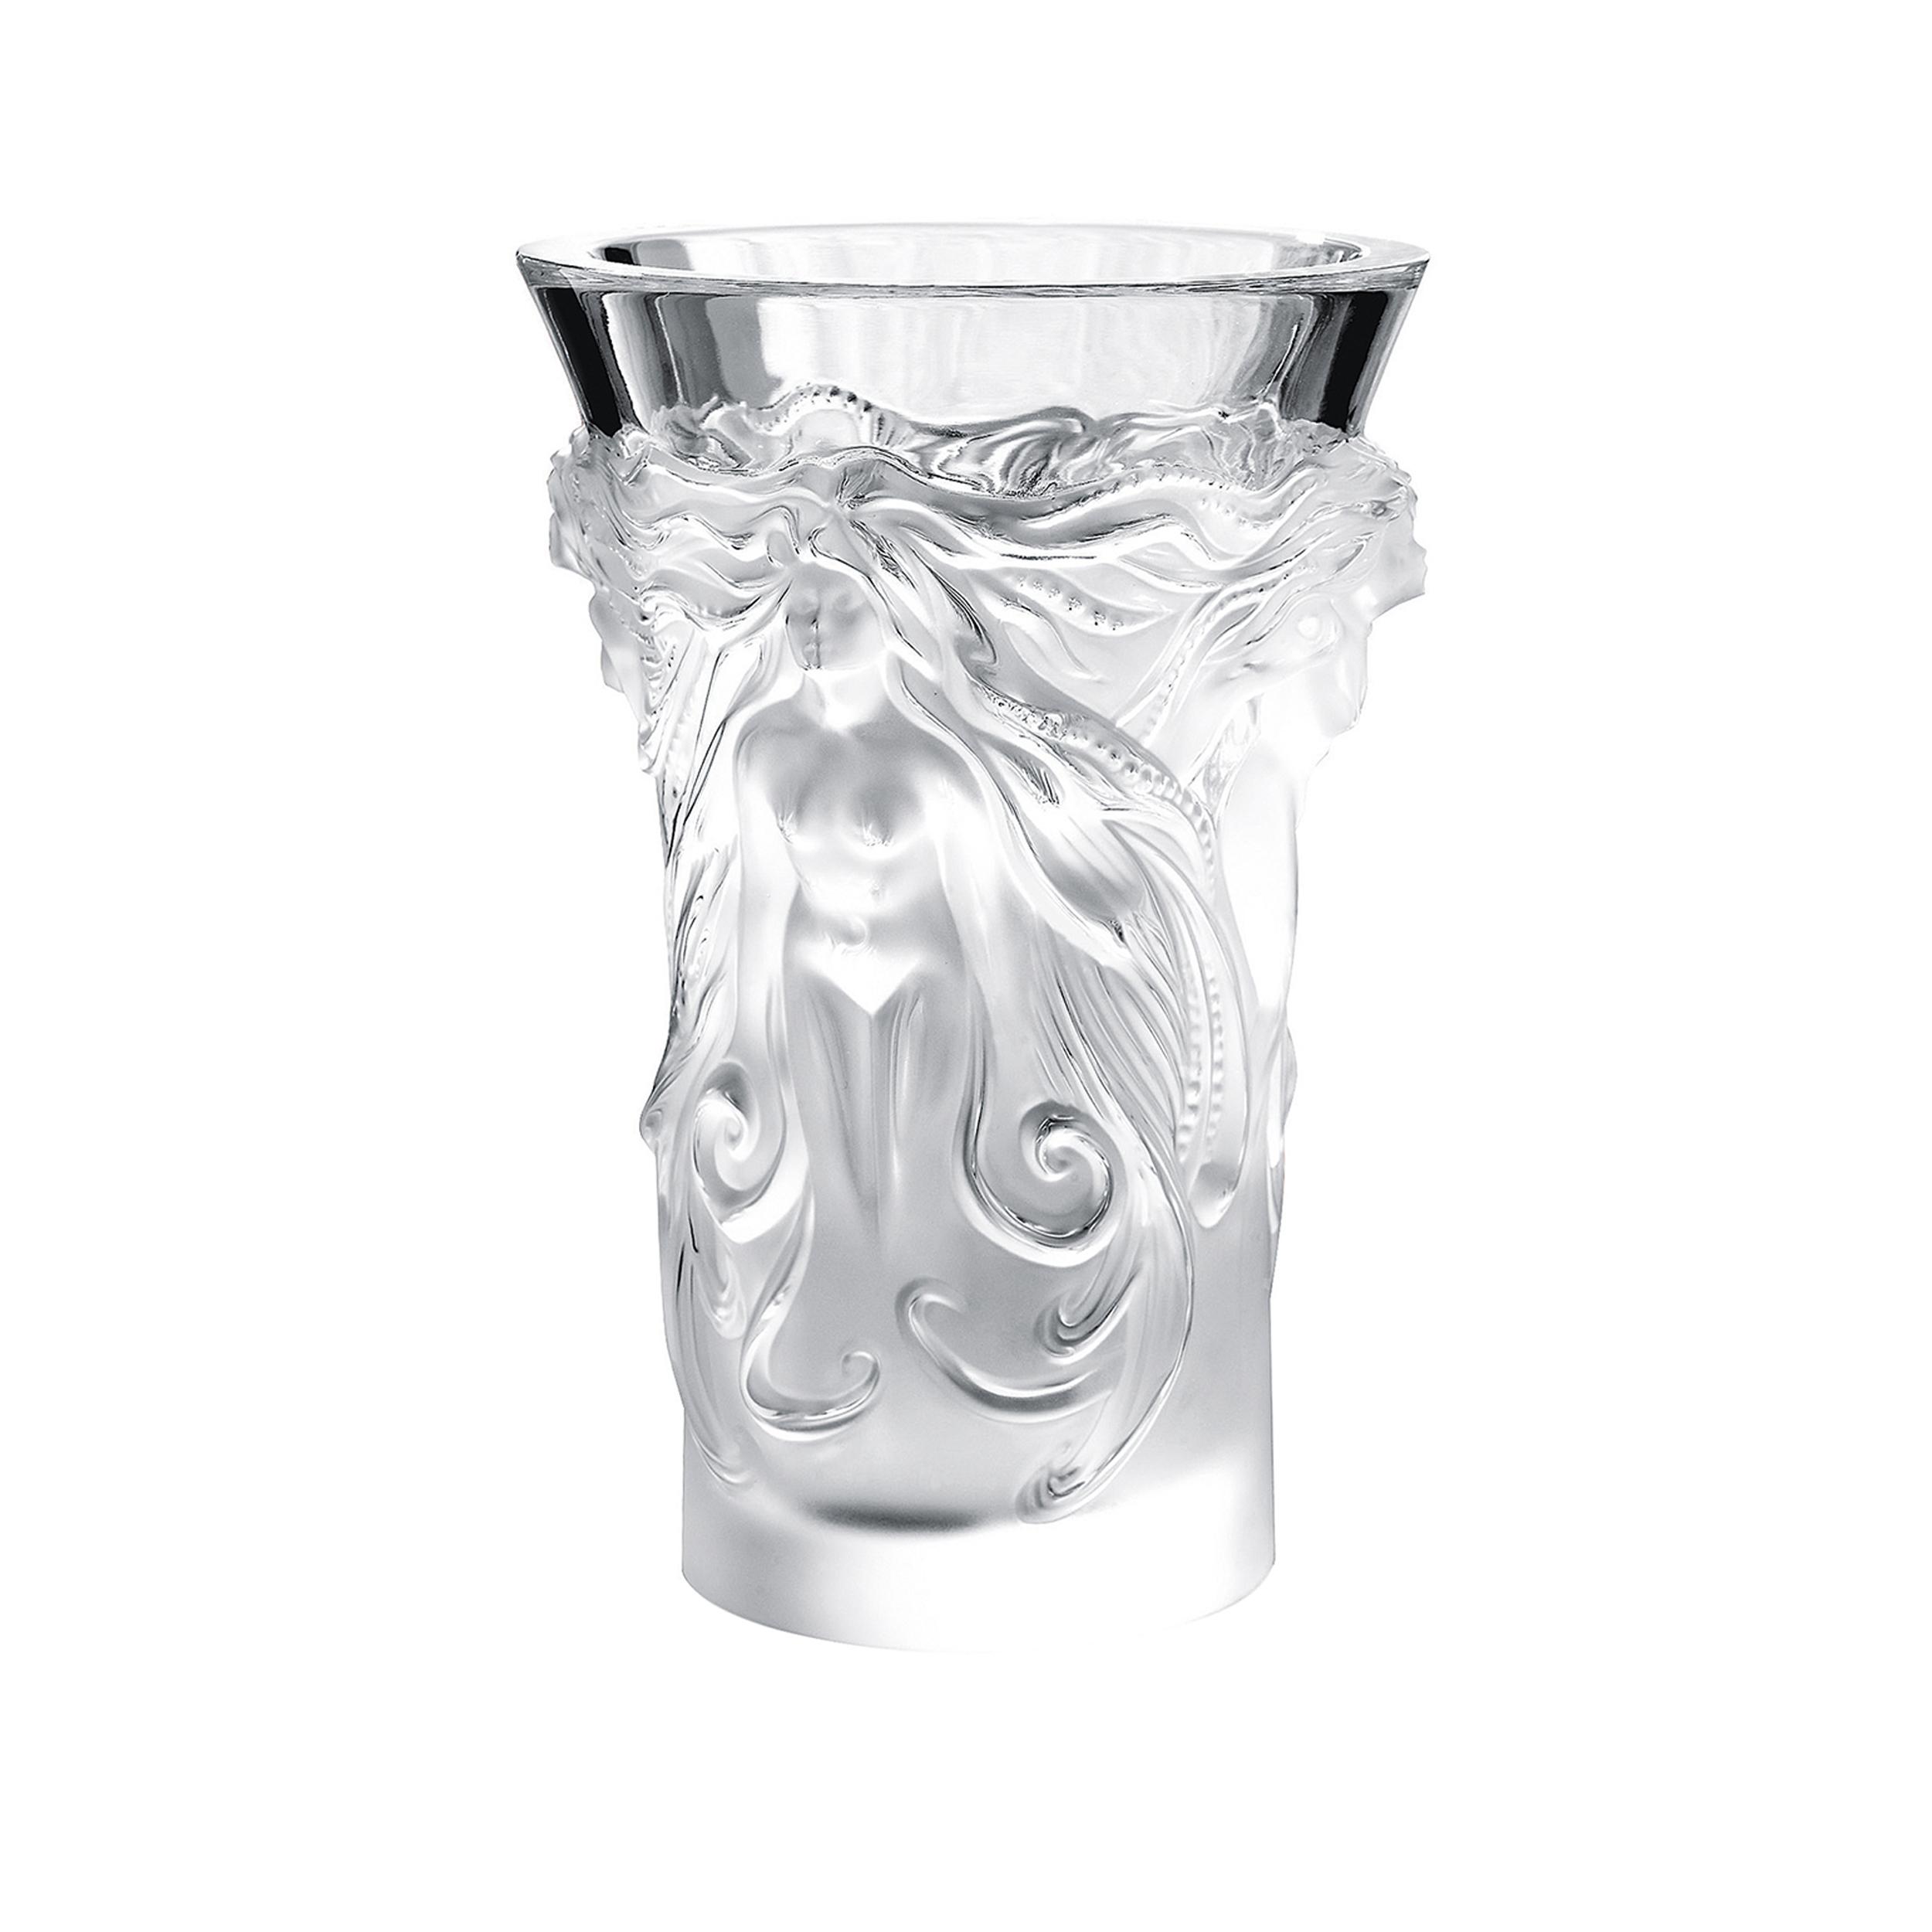 Fantasia ornament vase